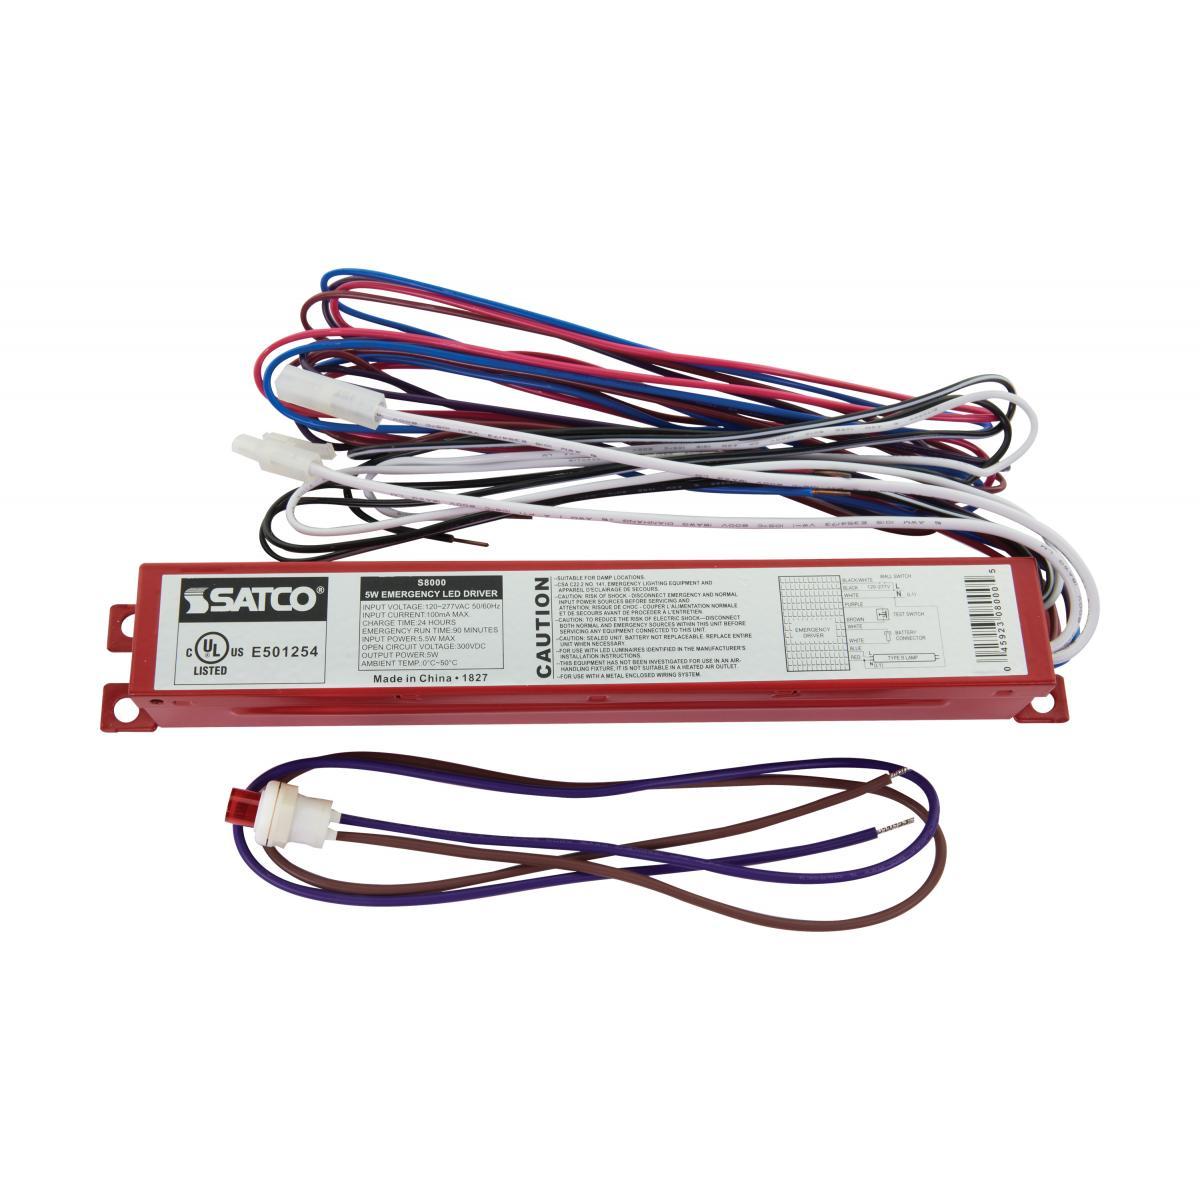 S8002 10W EMERGENCY LED DRIVER